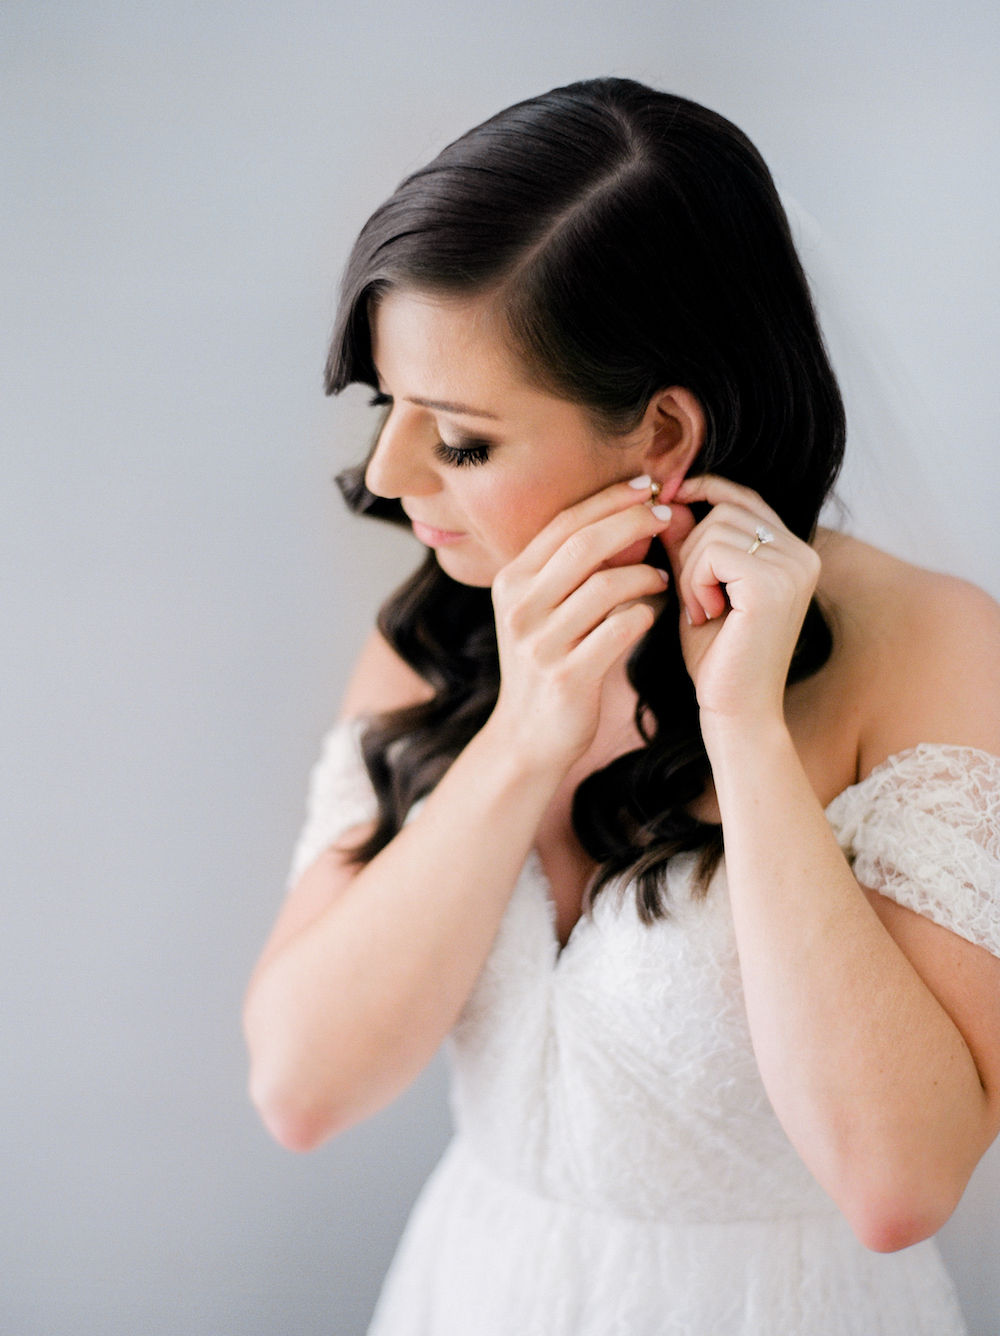 Sarah Seven Bridal Gown - Winnipeg Weddings